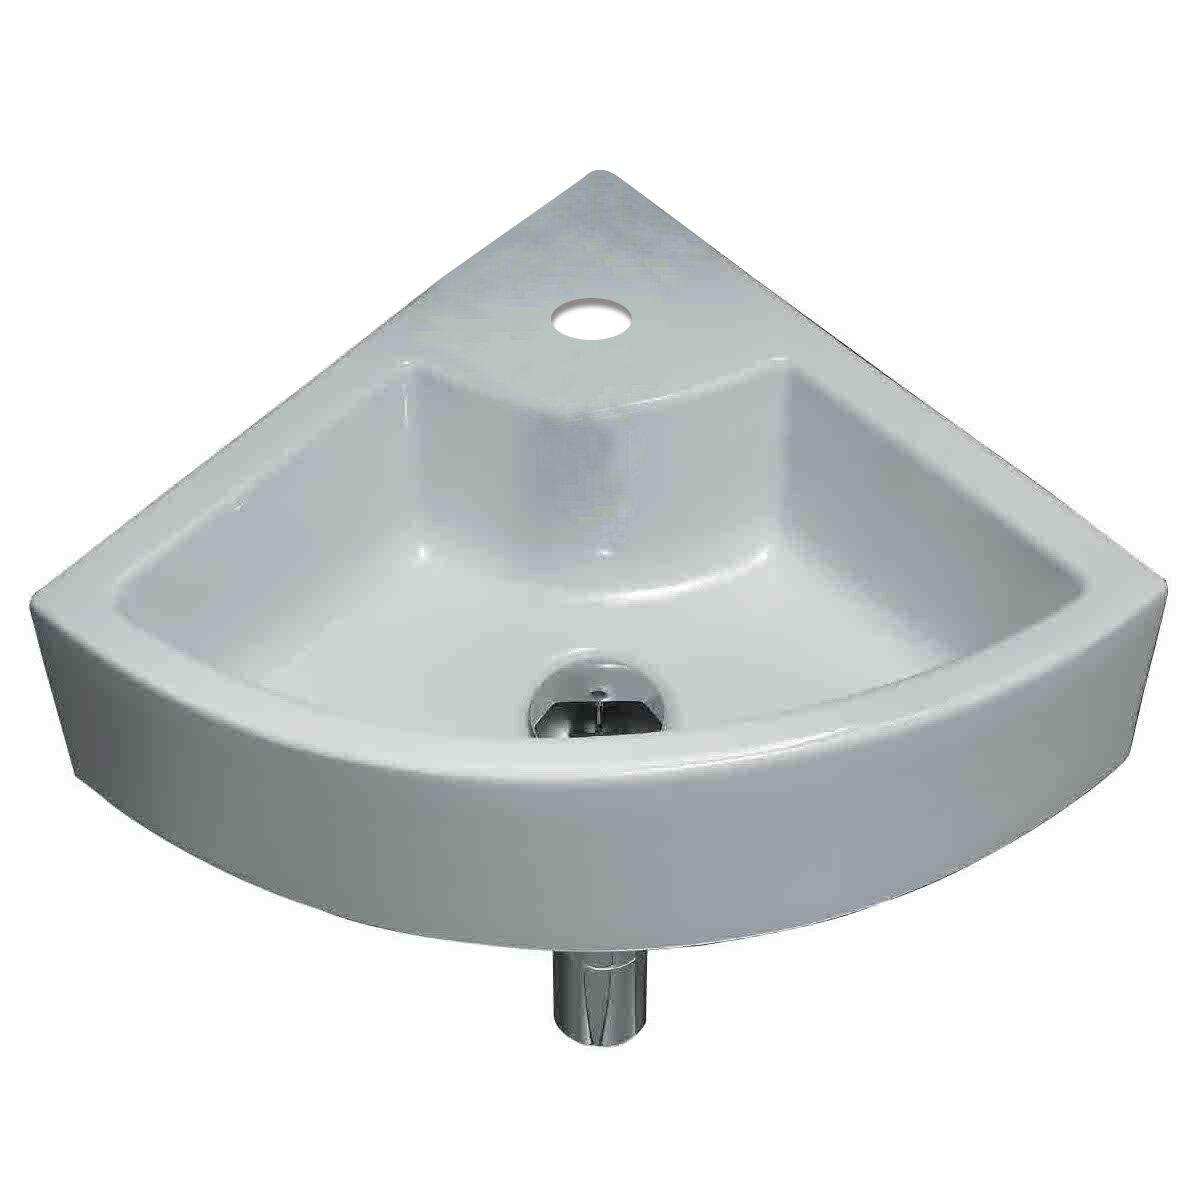 Cool Vessel Sinks : Unique Vessel Sink by American Imaginations